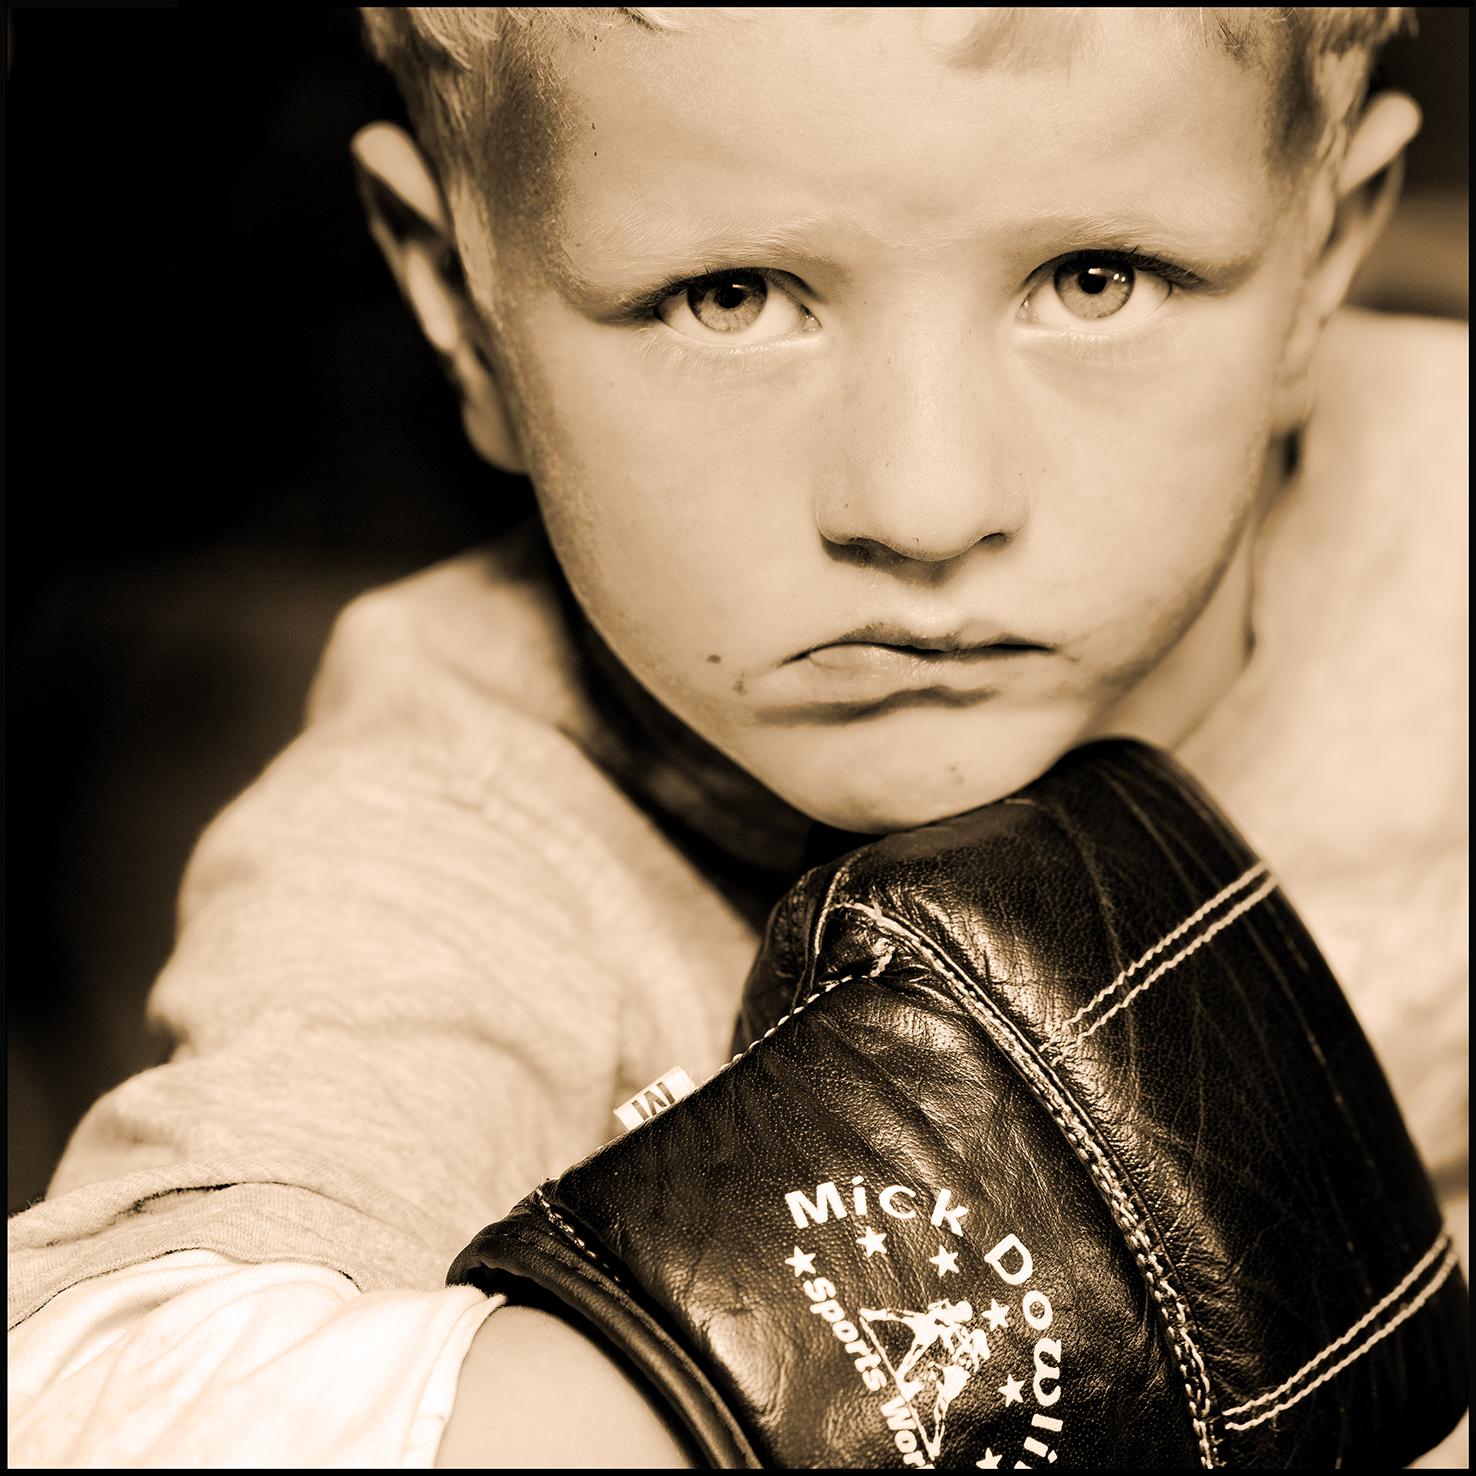 Boxing0315.jpg